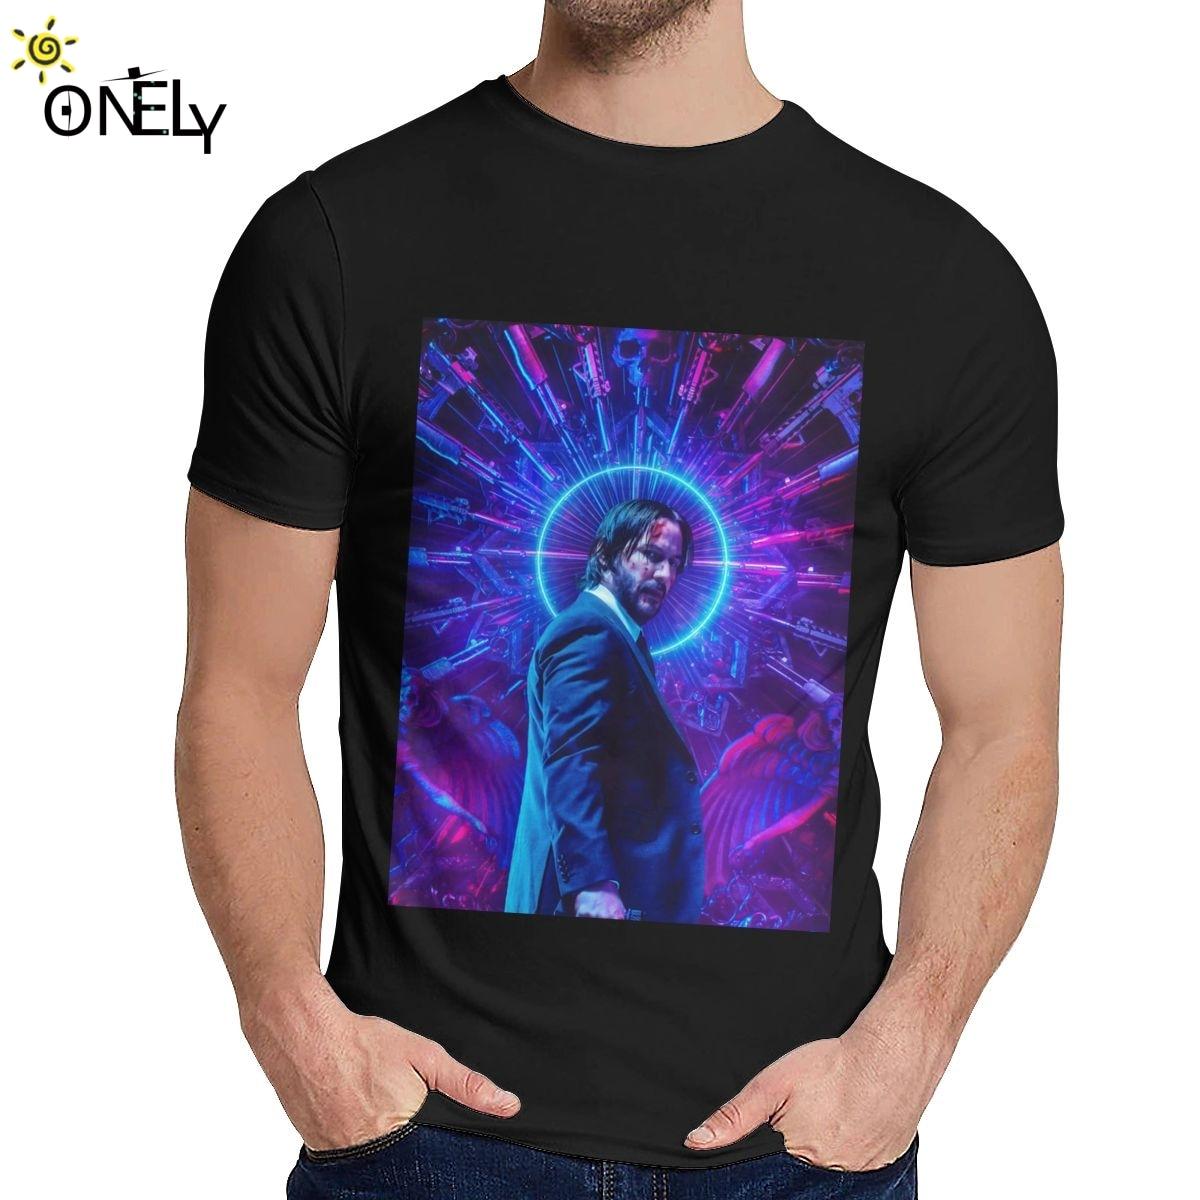 Suave John Wick película de acción Parabellum Keanu Reeves camiseta hombres Harajuku suave algodón moda o-cuello camiseta